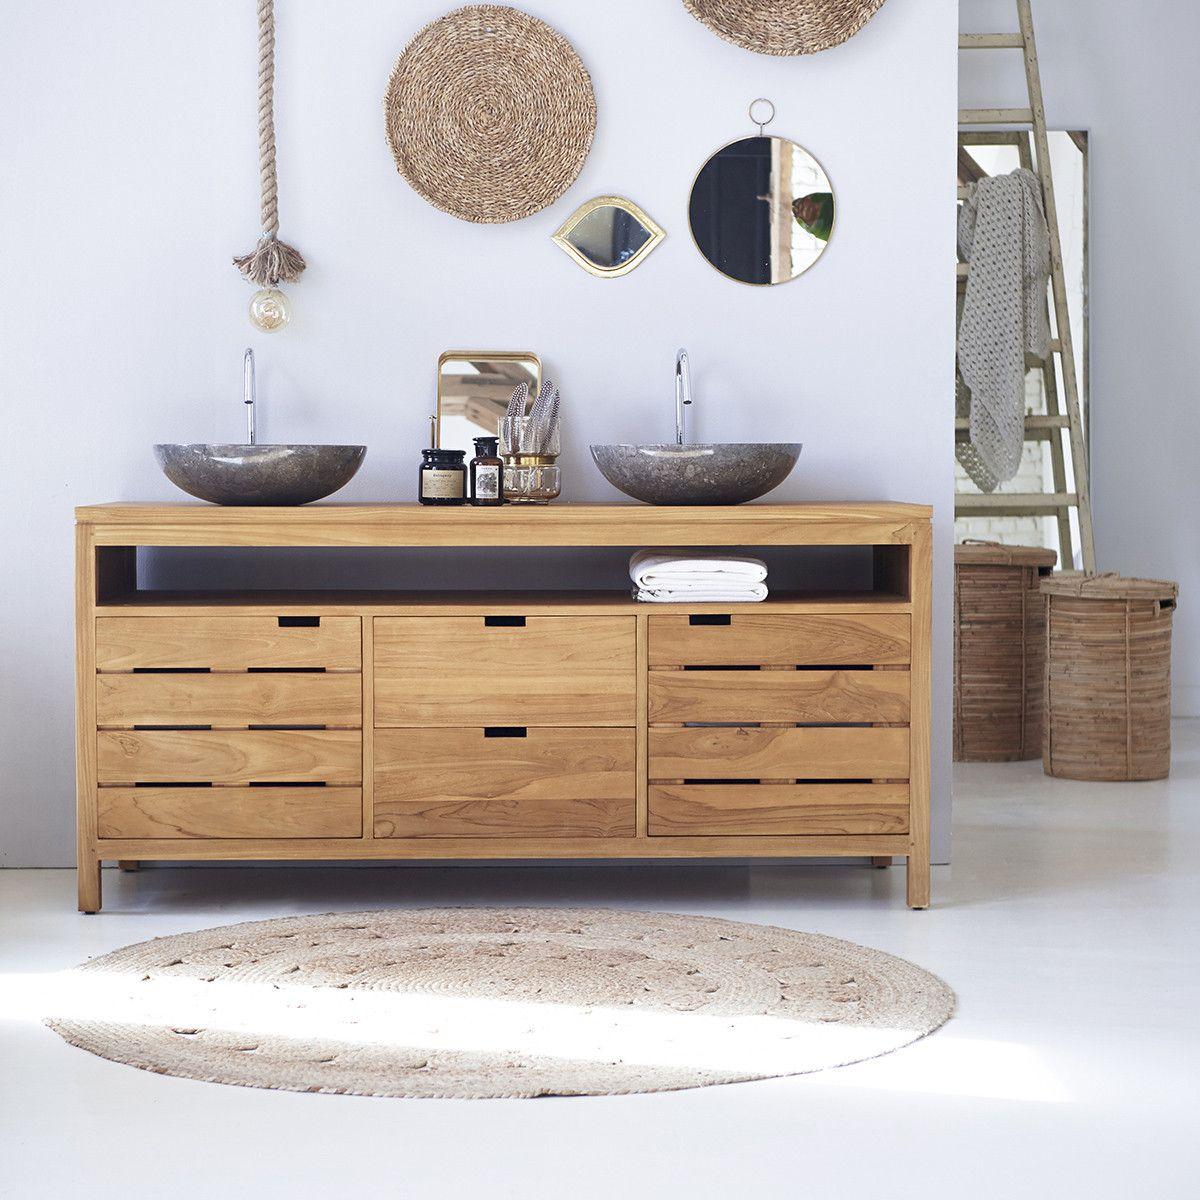 Photo of Solid teak wood vanity cabinet wash-stand counterdesign drawers bathroom